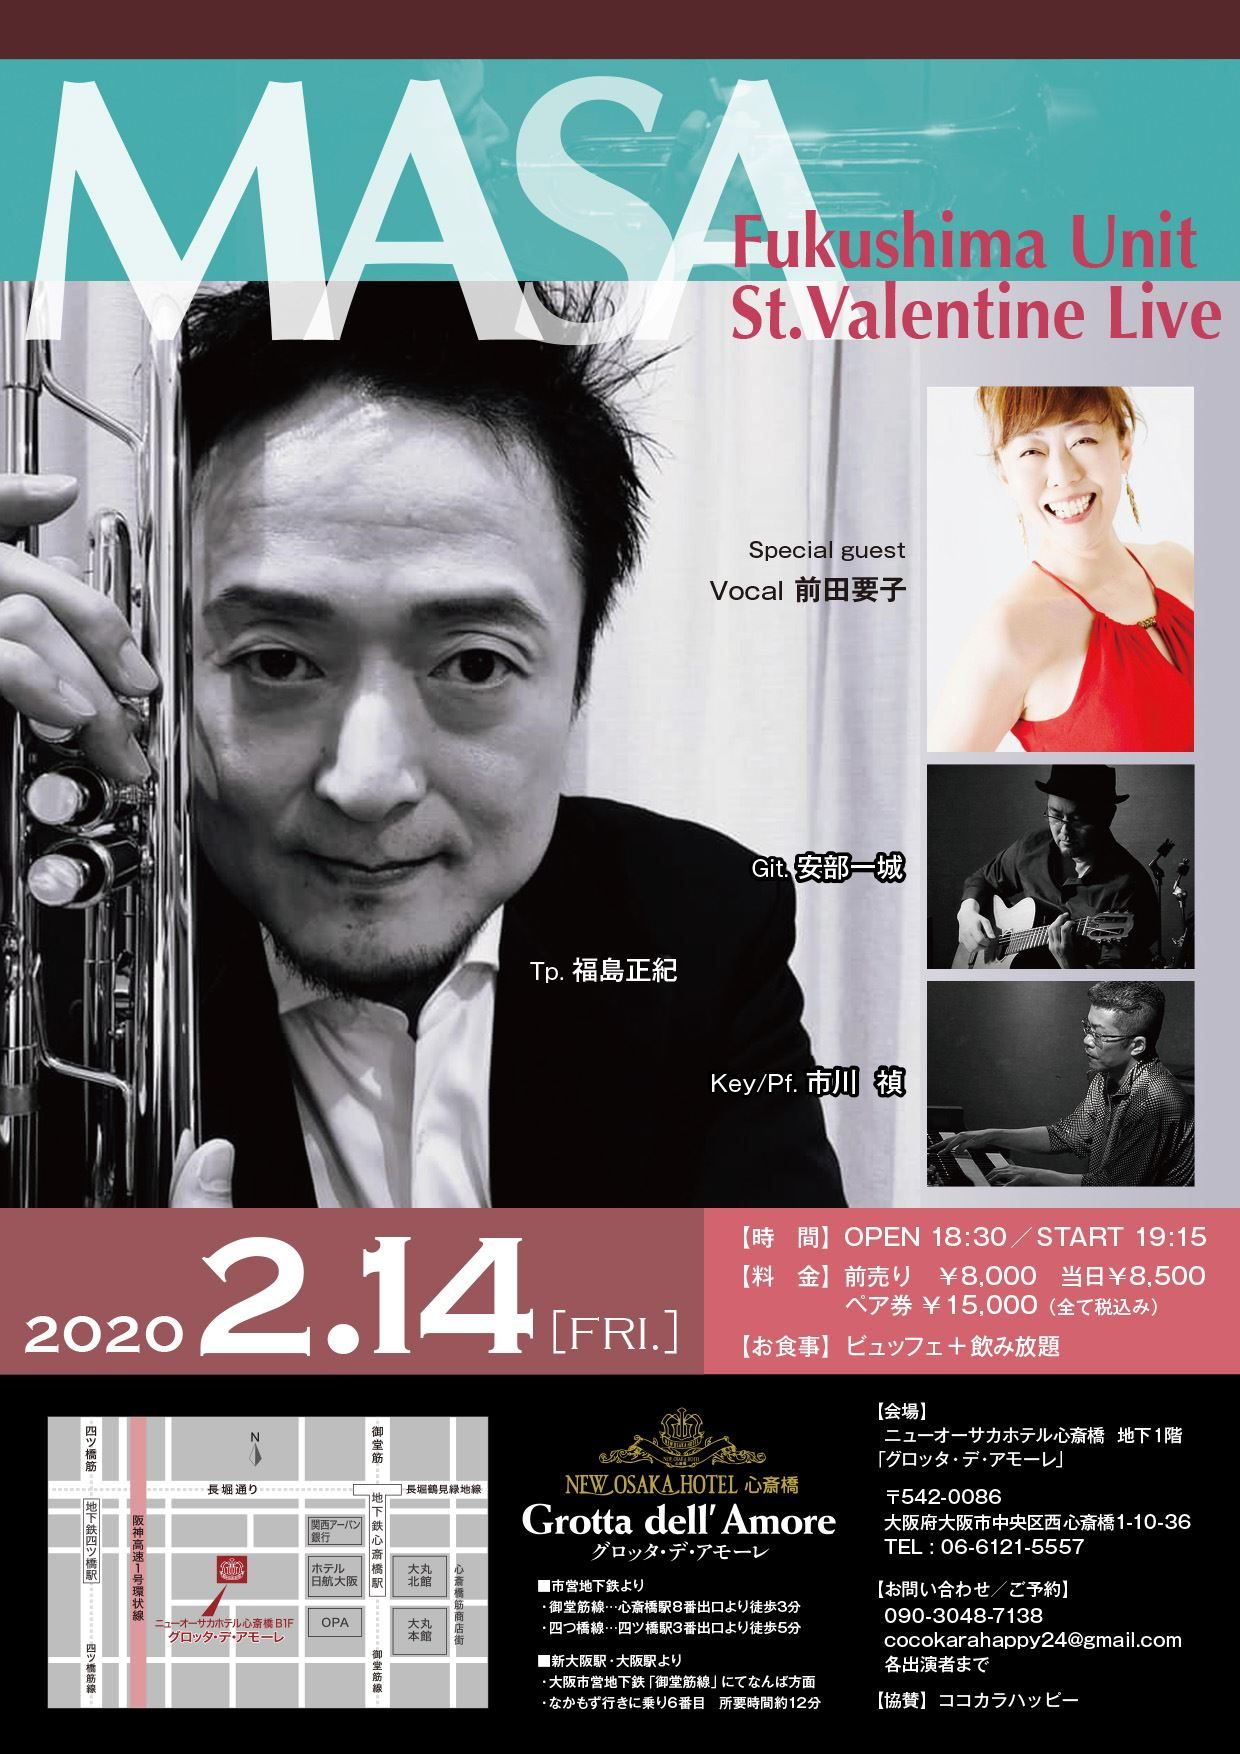 MASA Fukushima Unit St.Valentine Live in OSAKA